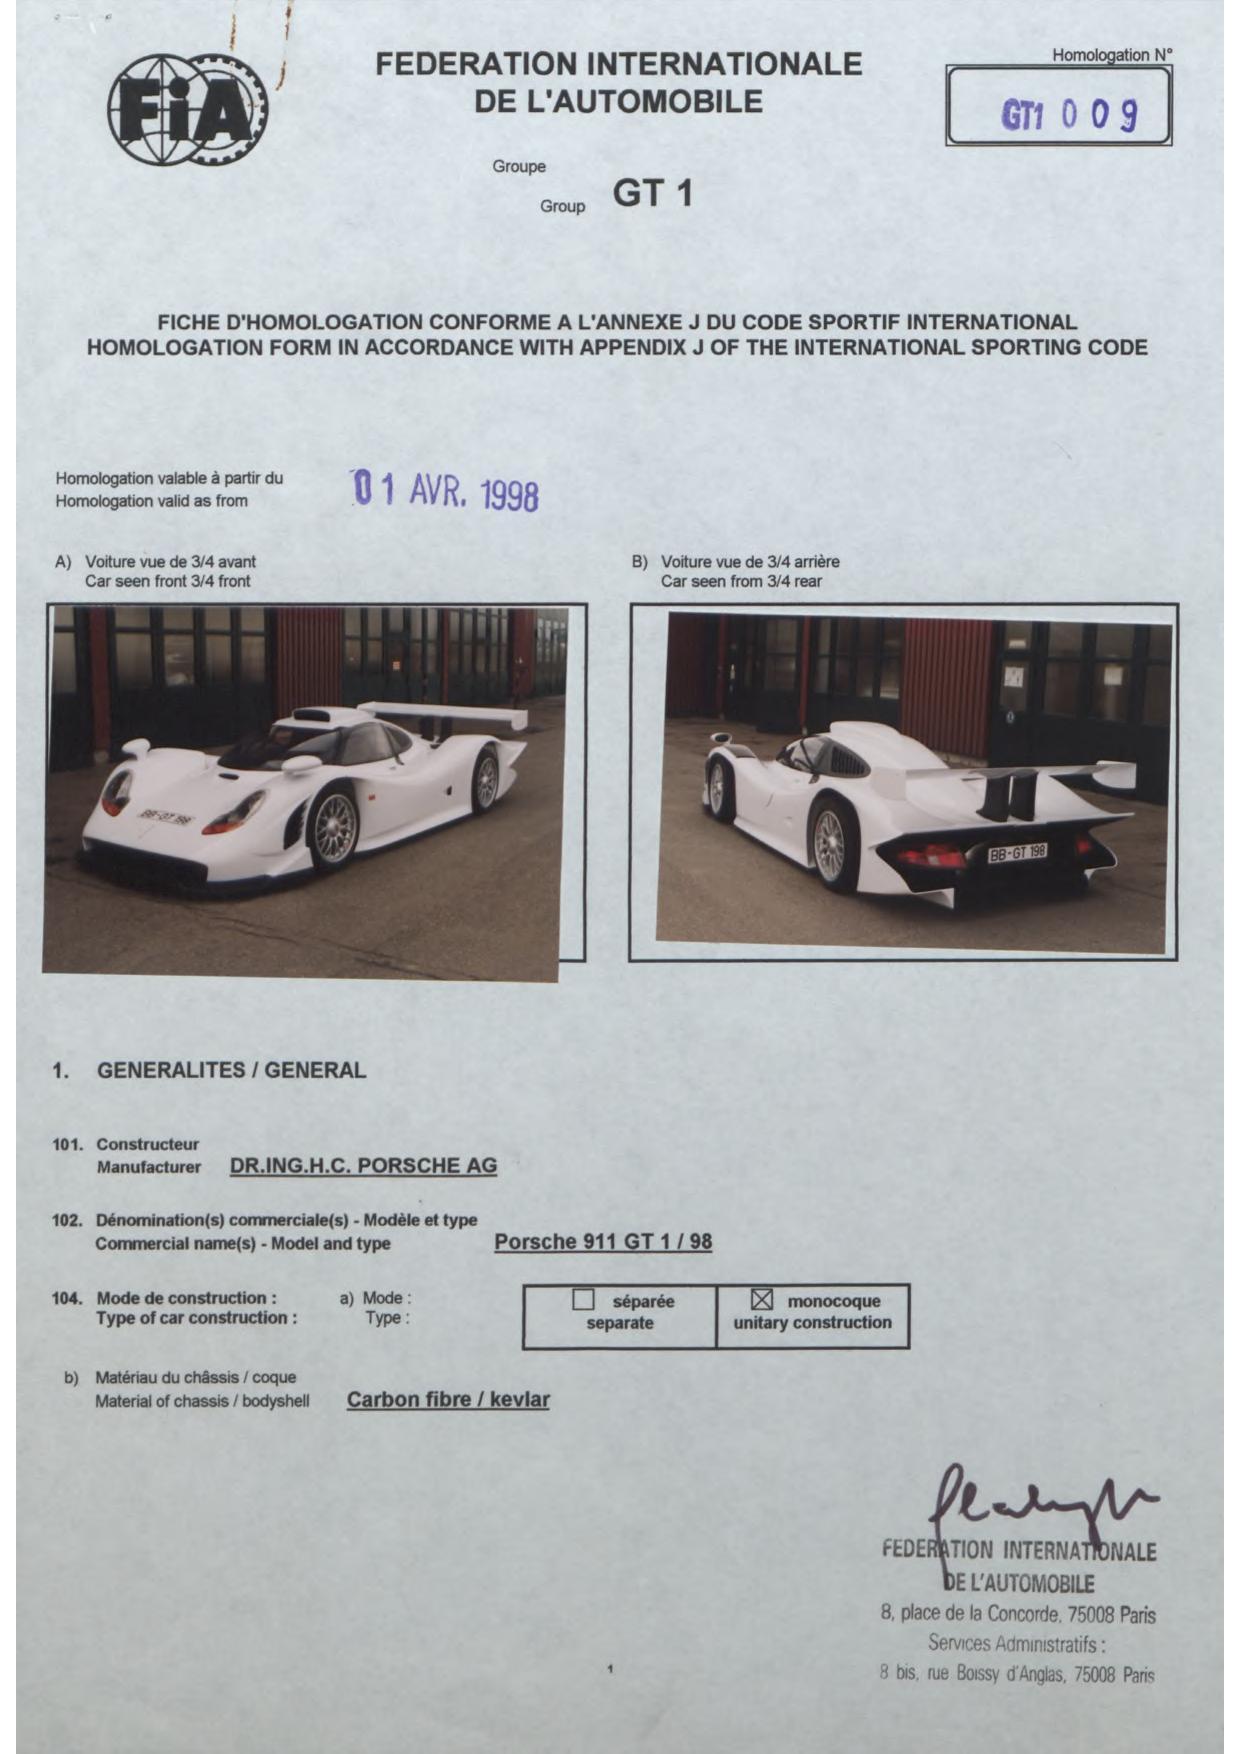 01 Wonderful 1998 Porsche 911 Gt1 Specs Cars Trend